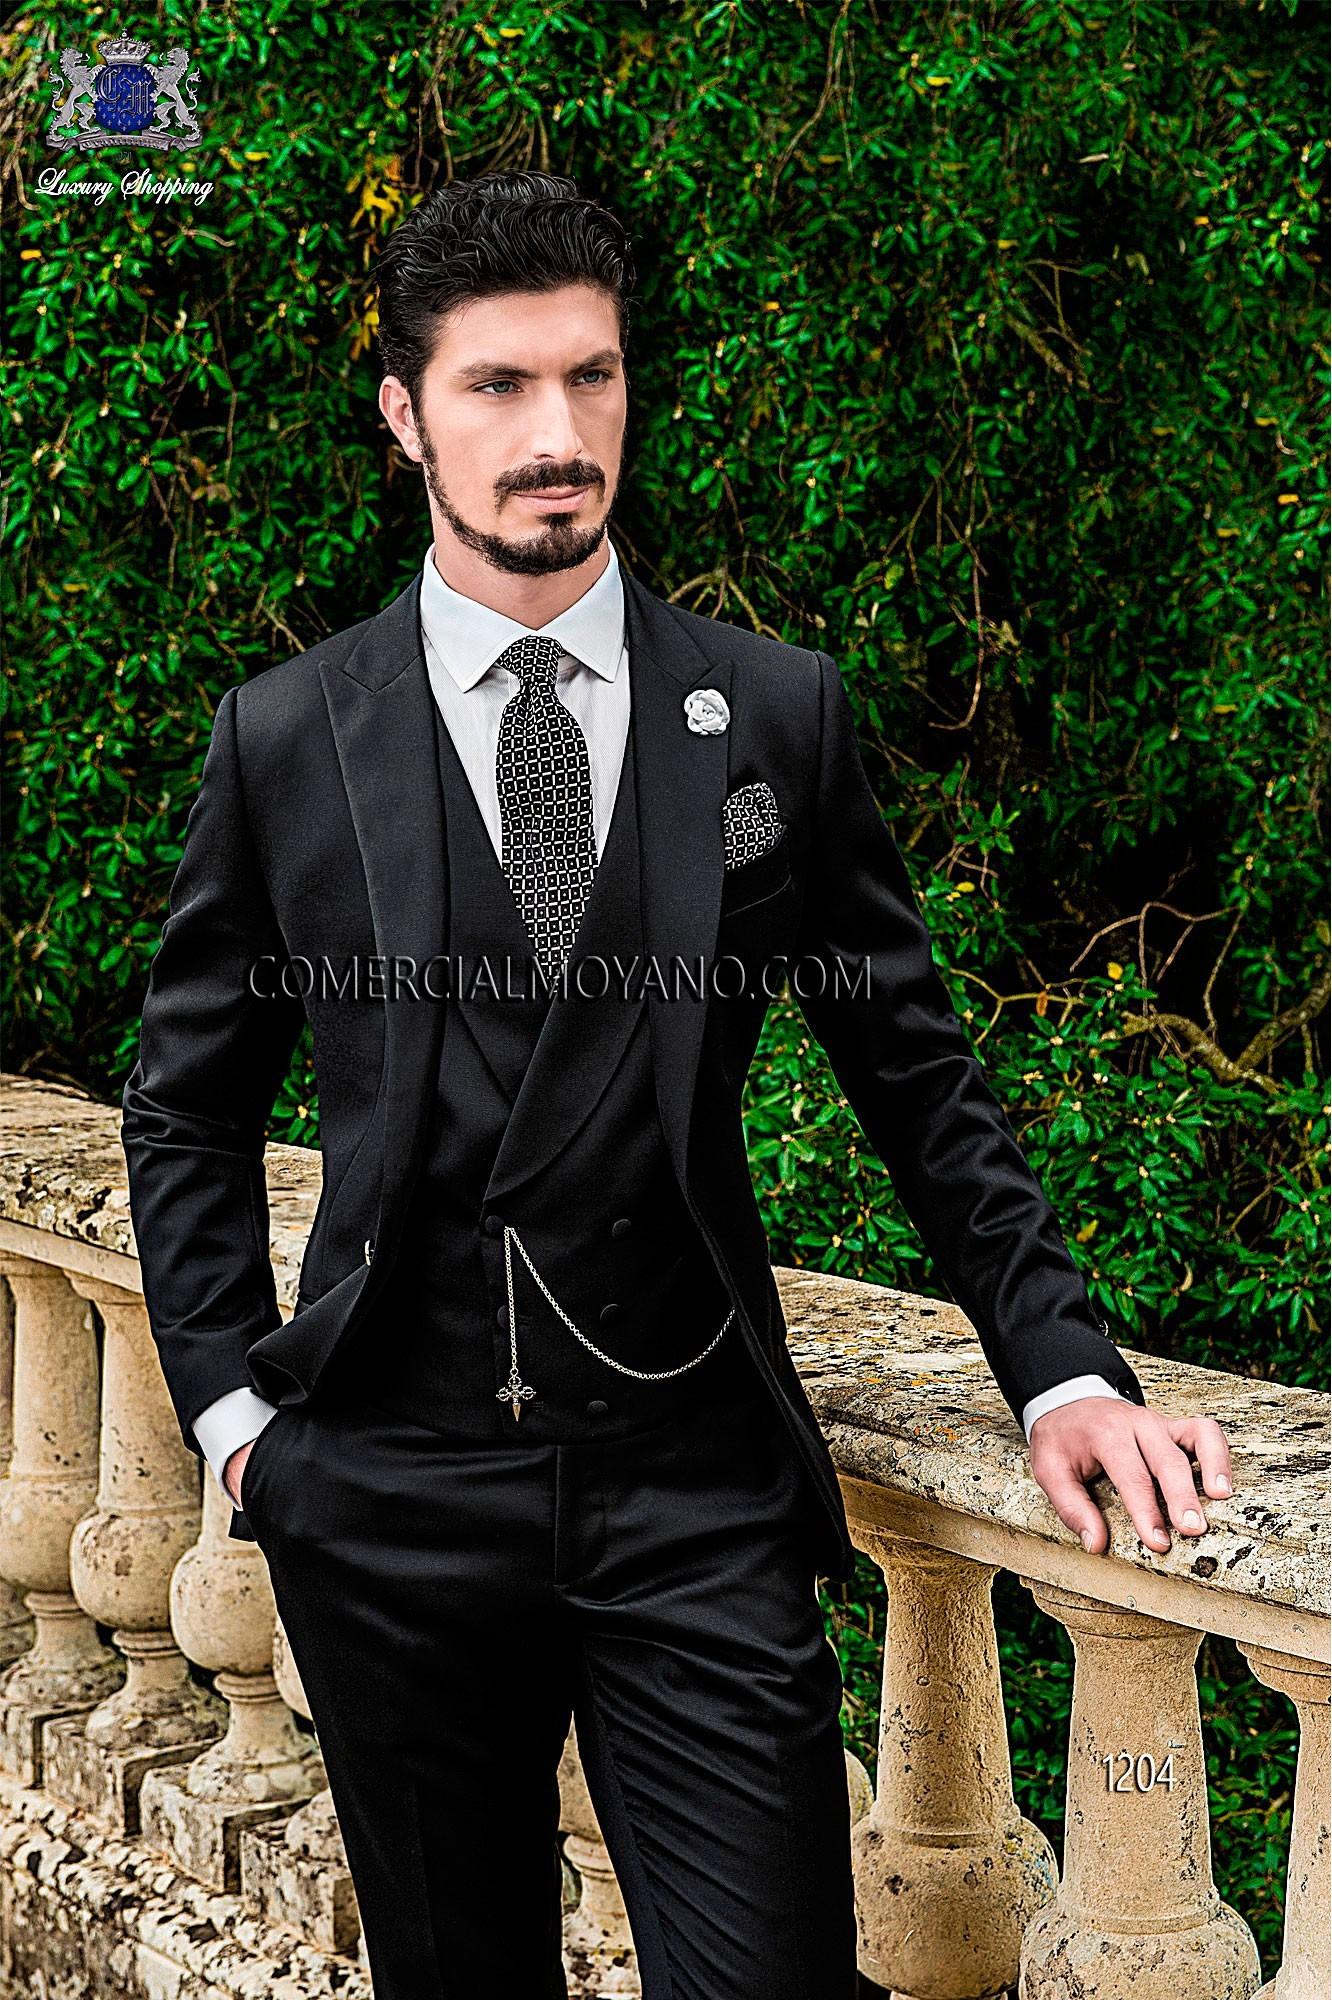 Gentleman black men wedding suit model 1204 Ottavio Nuccio Gala